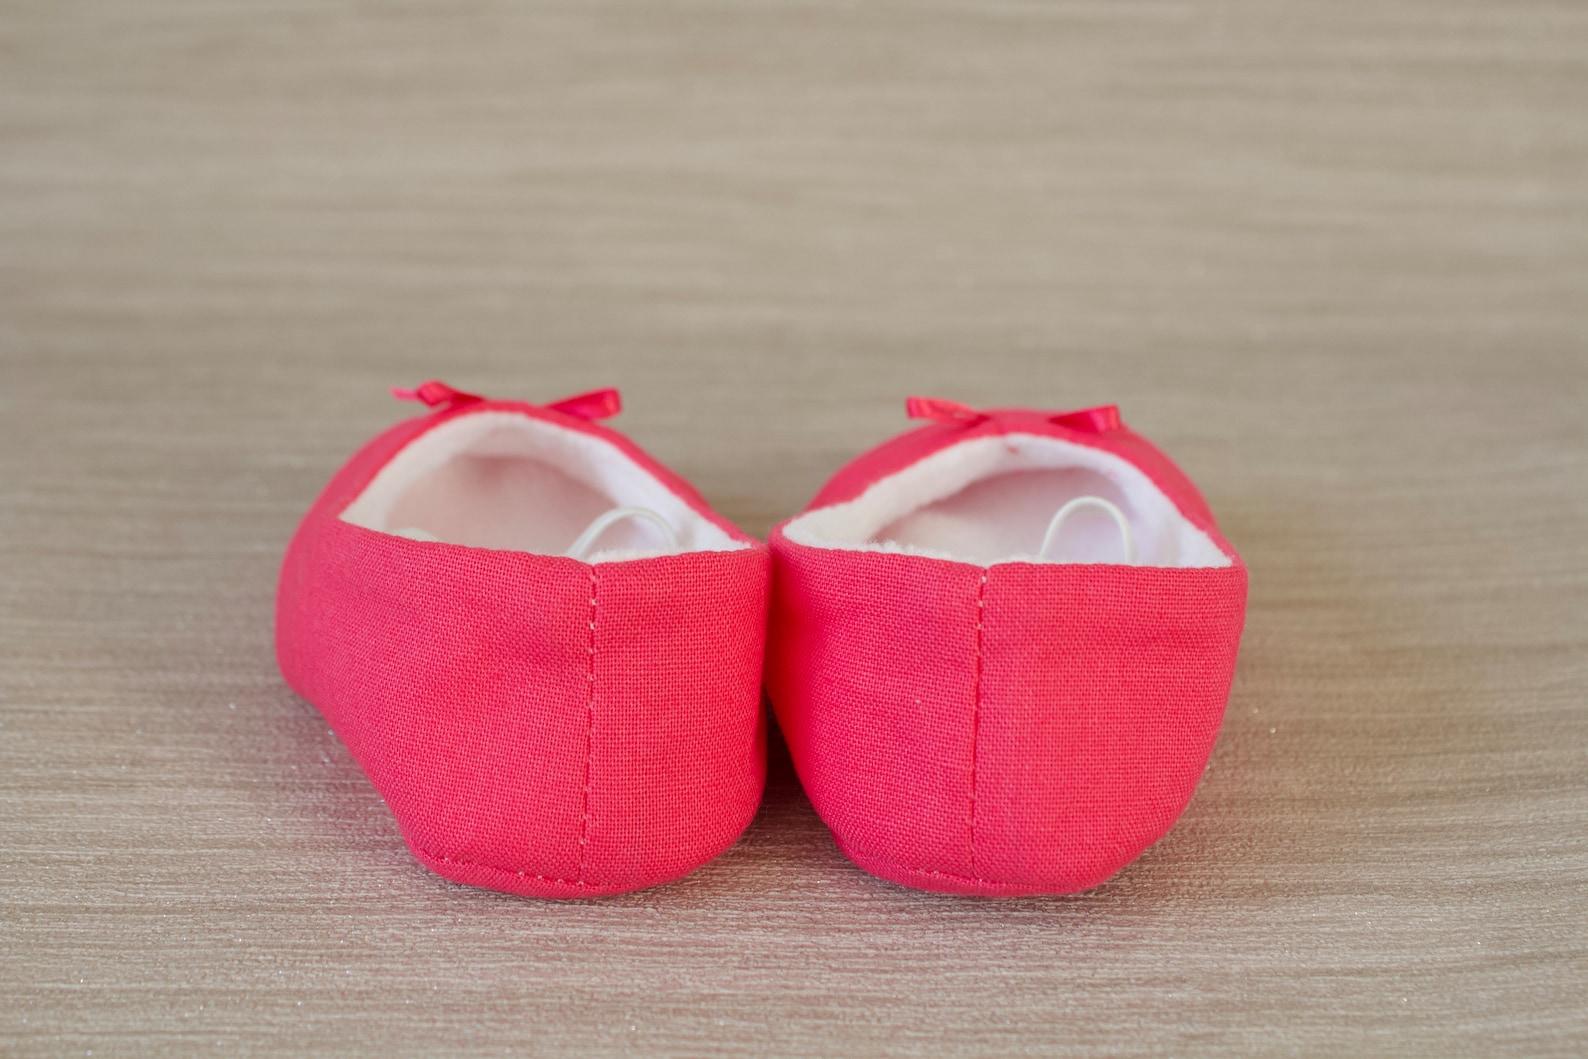 baby girl shoe, baby shoe ballet flat, magenta pink baby girl shoe, girls shoe, baby ballet flat.